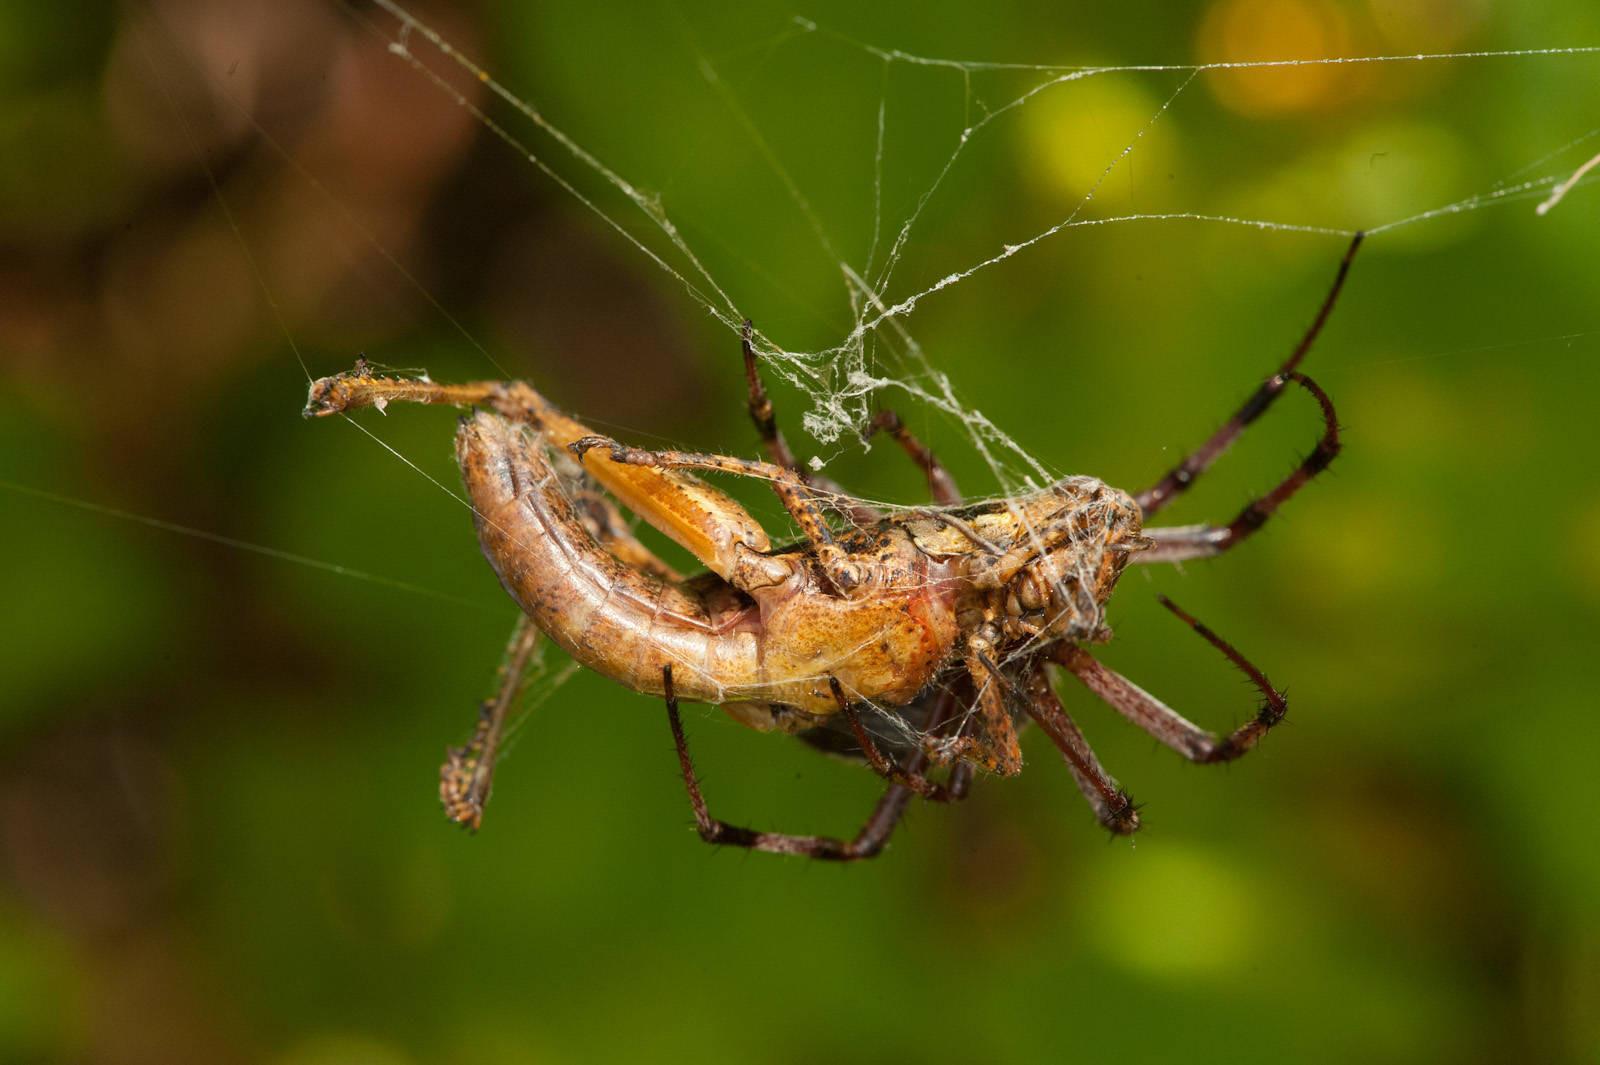 Photo: A zig-zag spider (Neoscona cooksoni) preys on a juvenile painted locust (Schistocerca melanocera) on Santa Cruz Island.